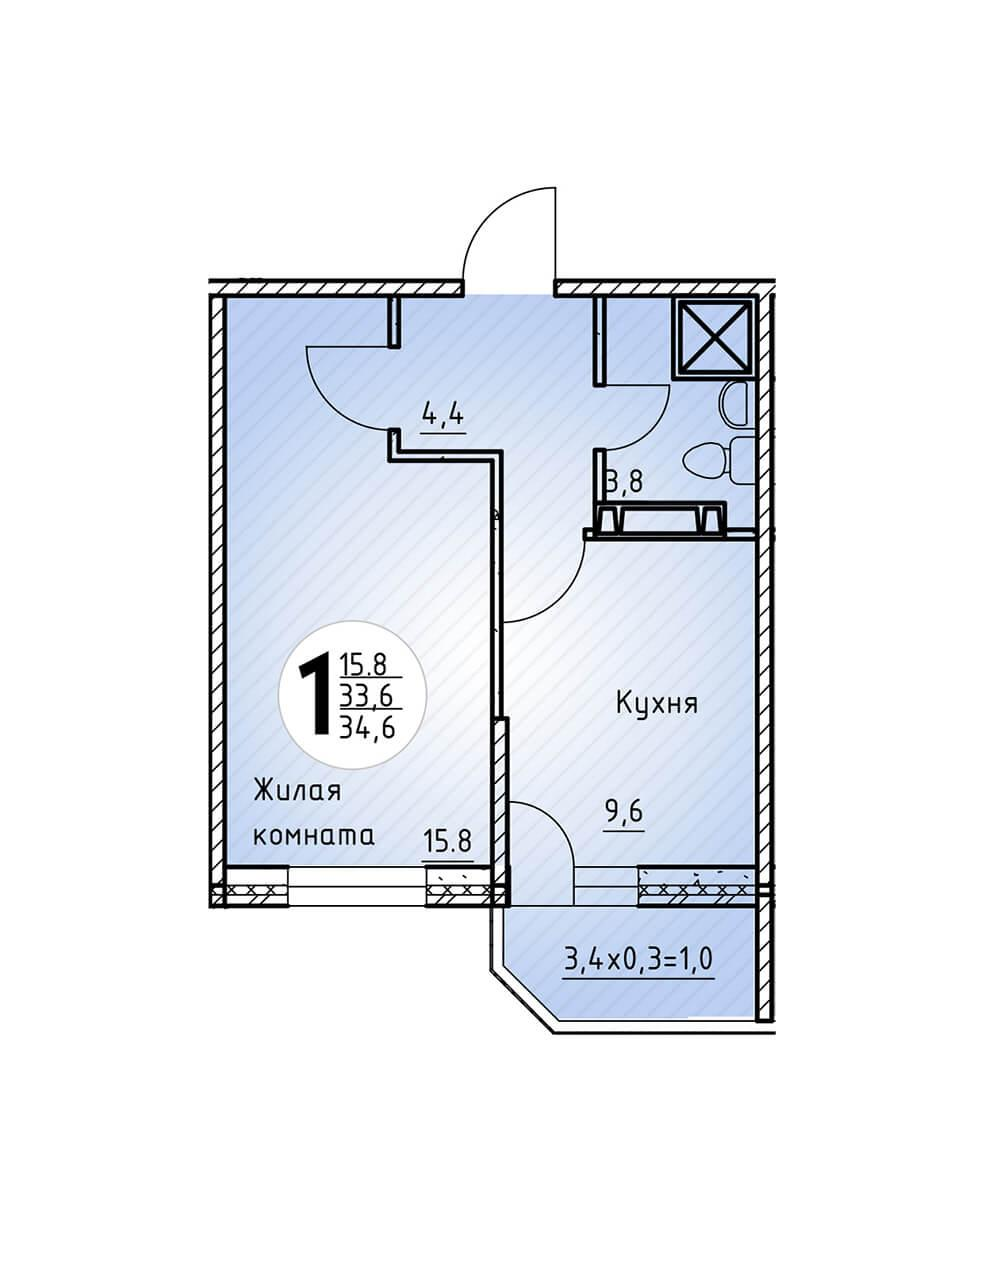 Однокомнатная квартира 34,6 кв.м.